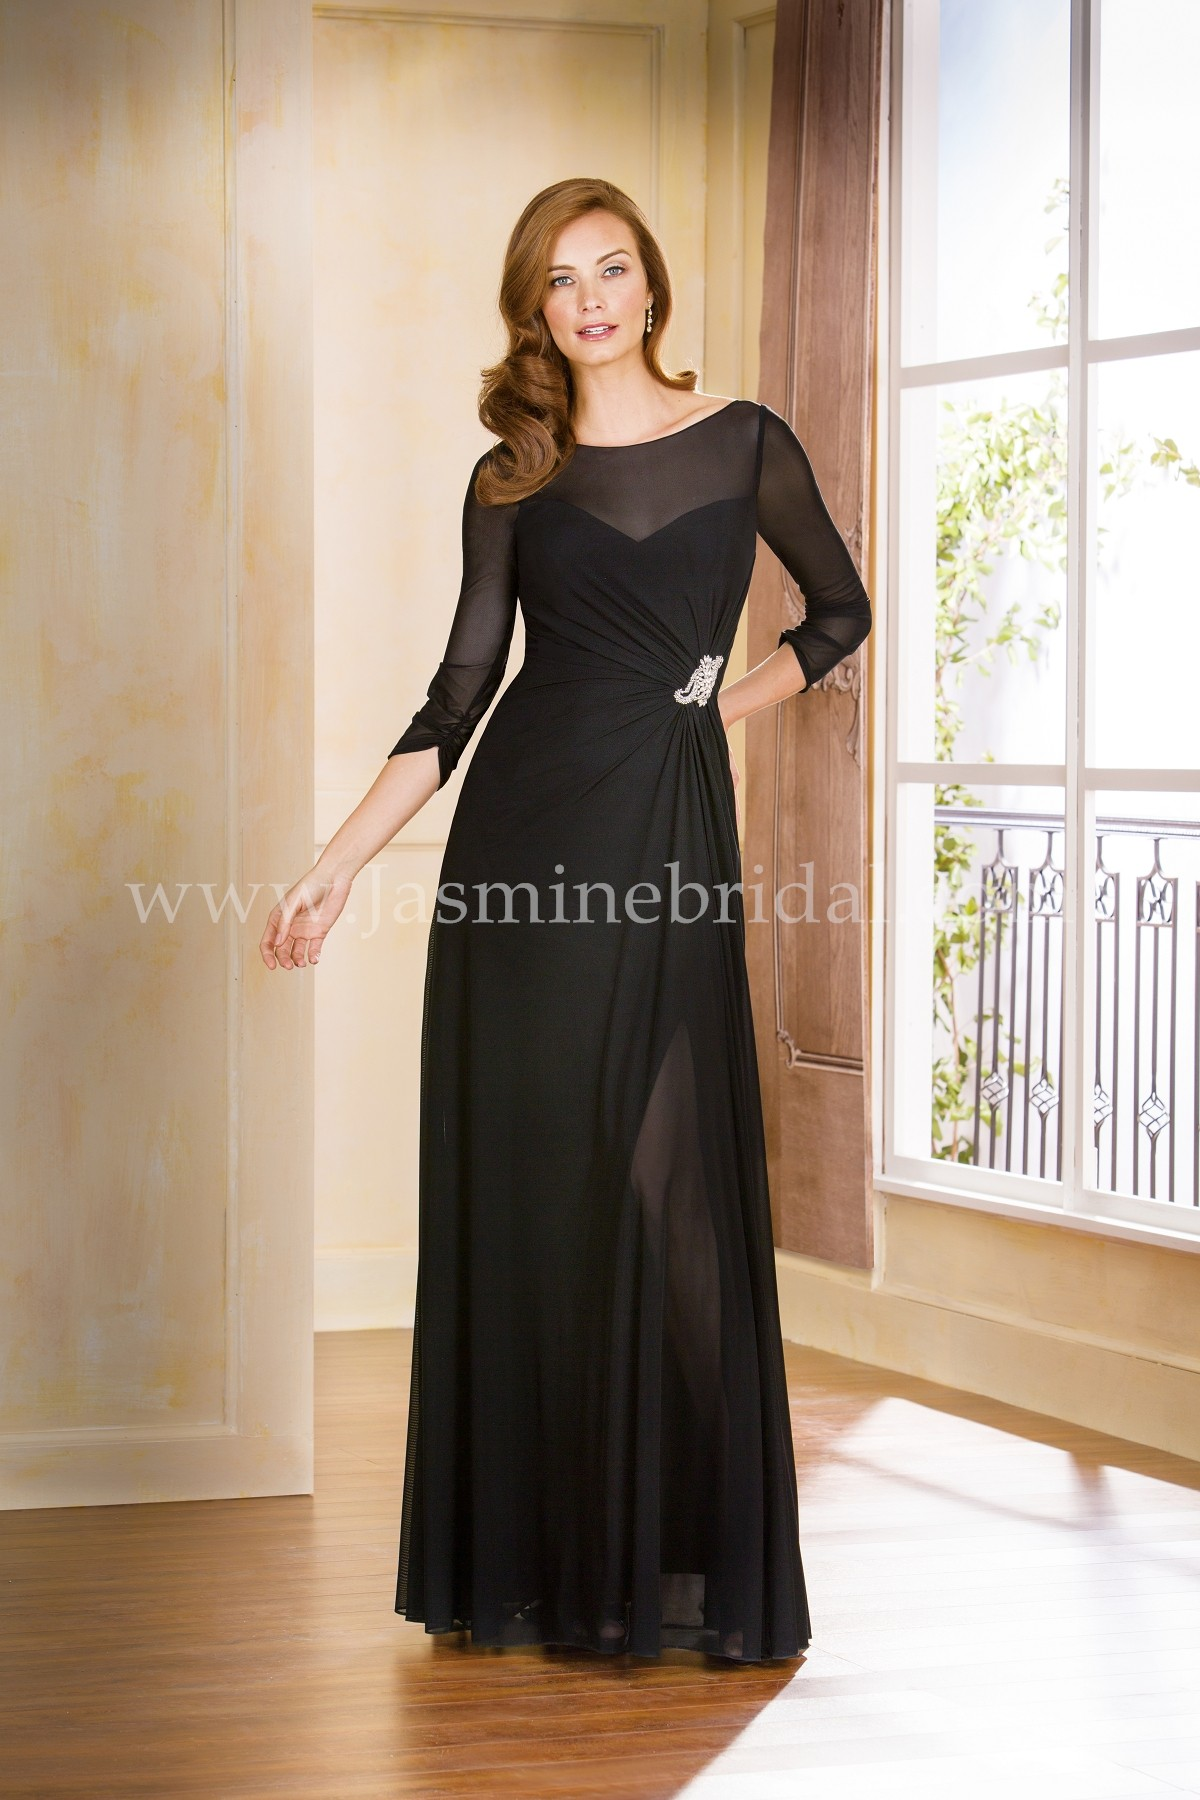 Frascara Mother of the Bride Dresses